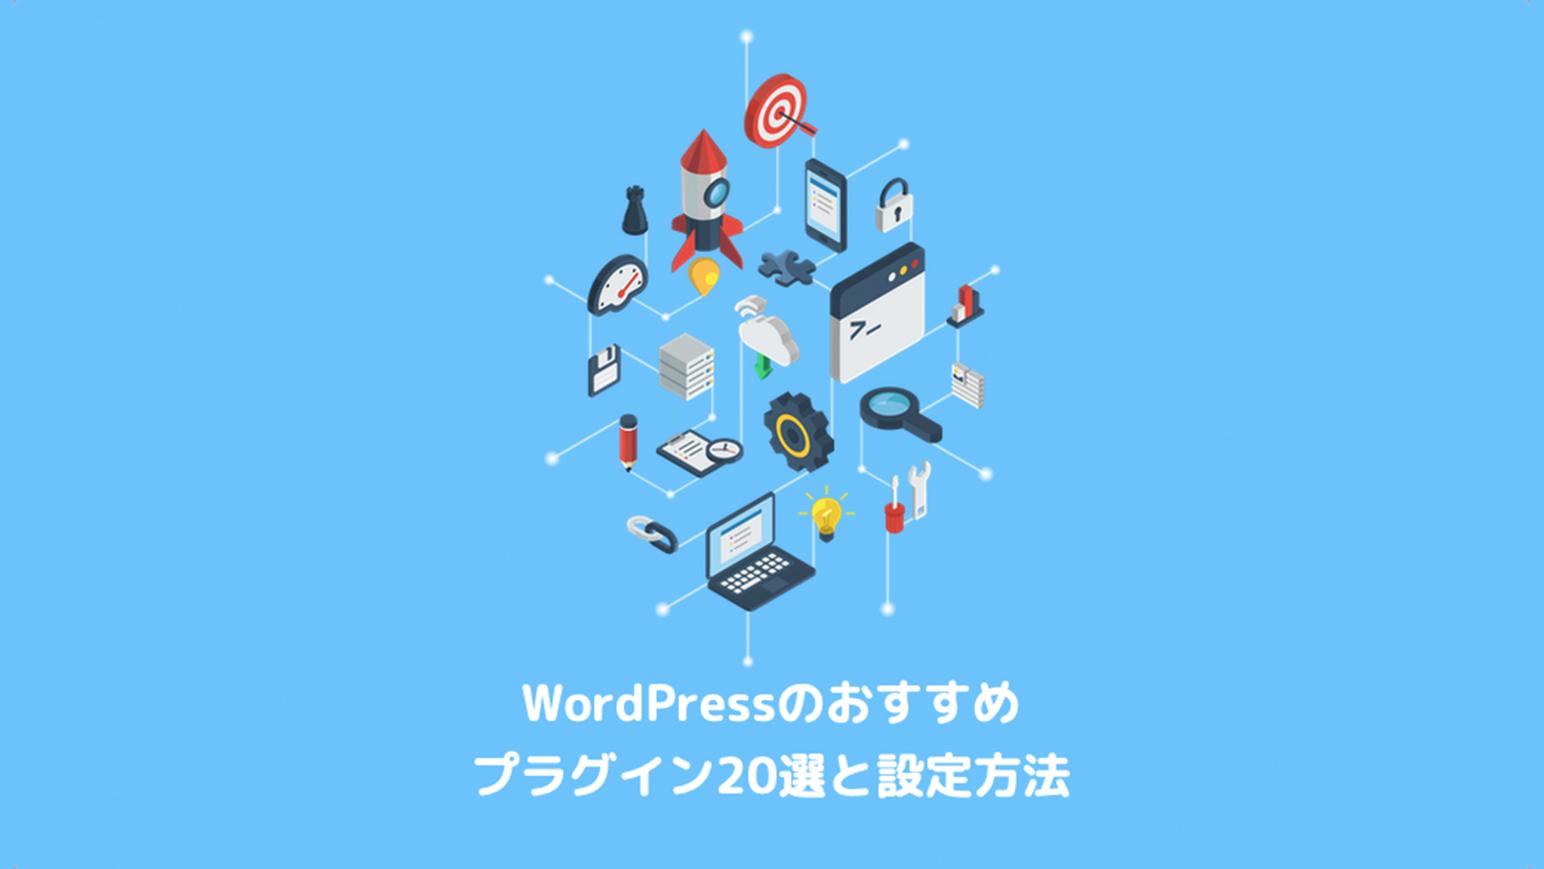 WordPressのおすすめプラグイン20選と設定方法のアイキャッチ